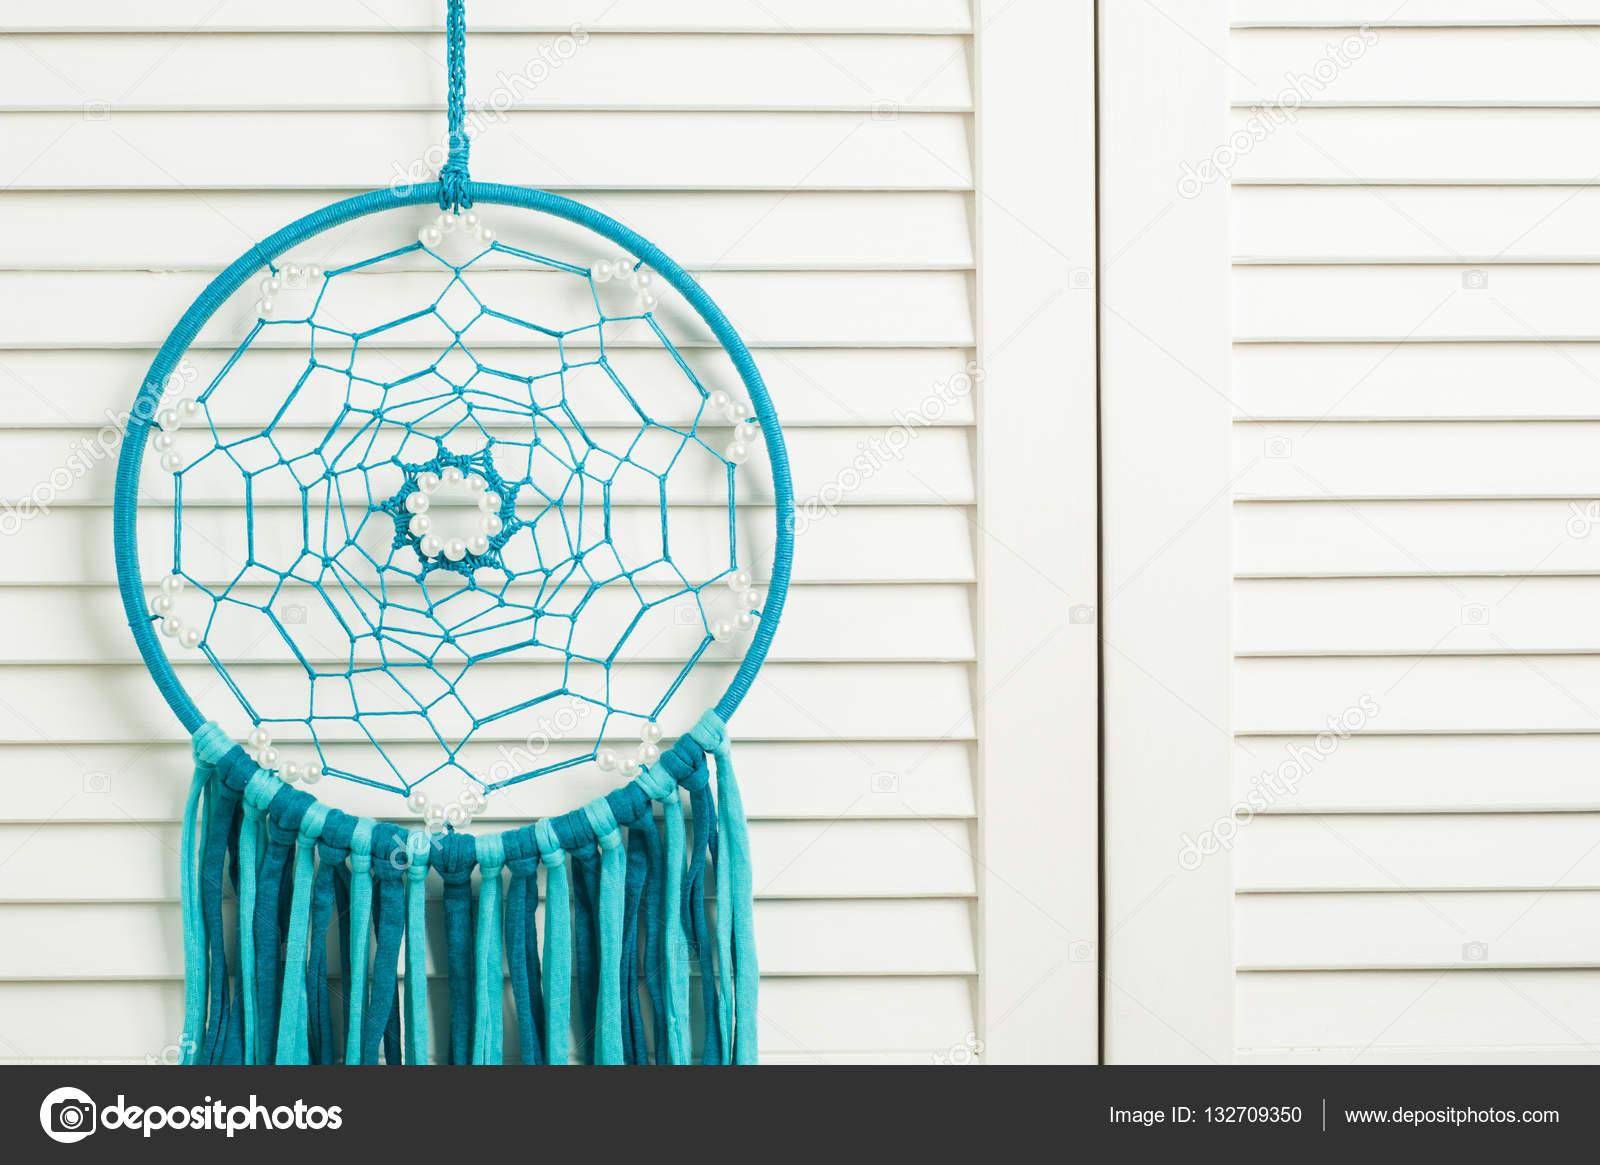 Traumfänger mit blau türkis threads — Stockfoto © irinabort #132709350